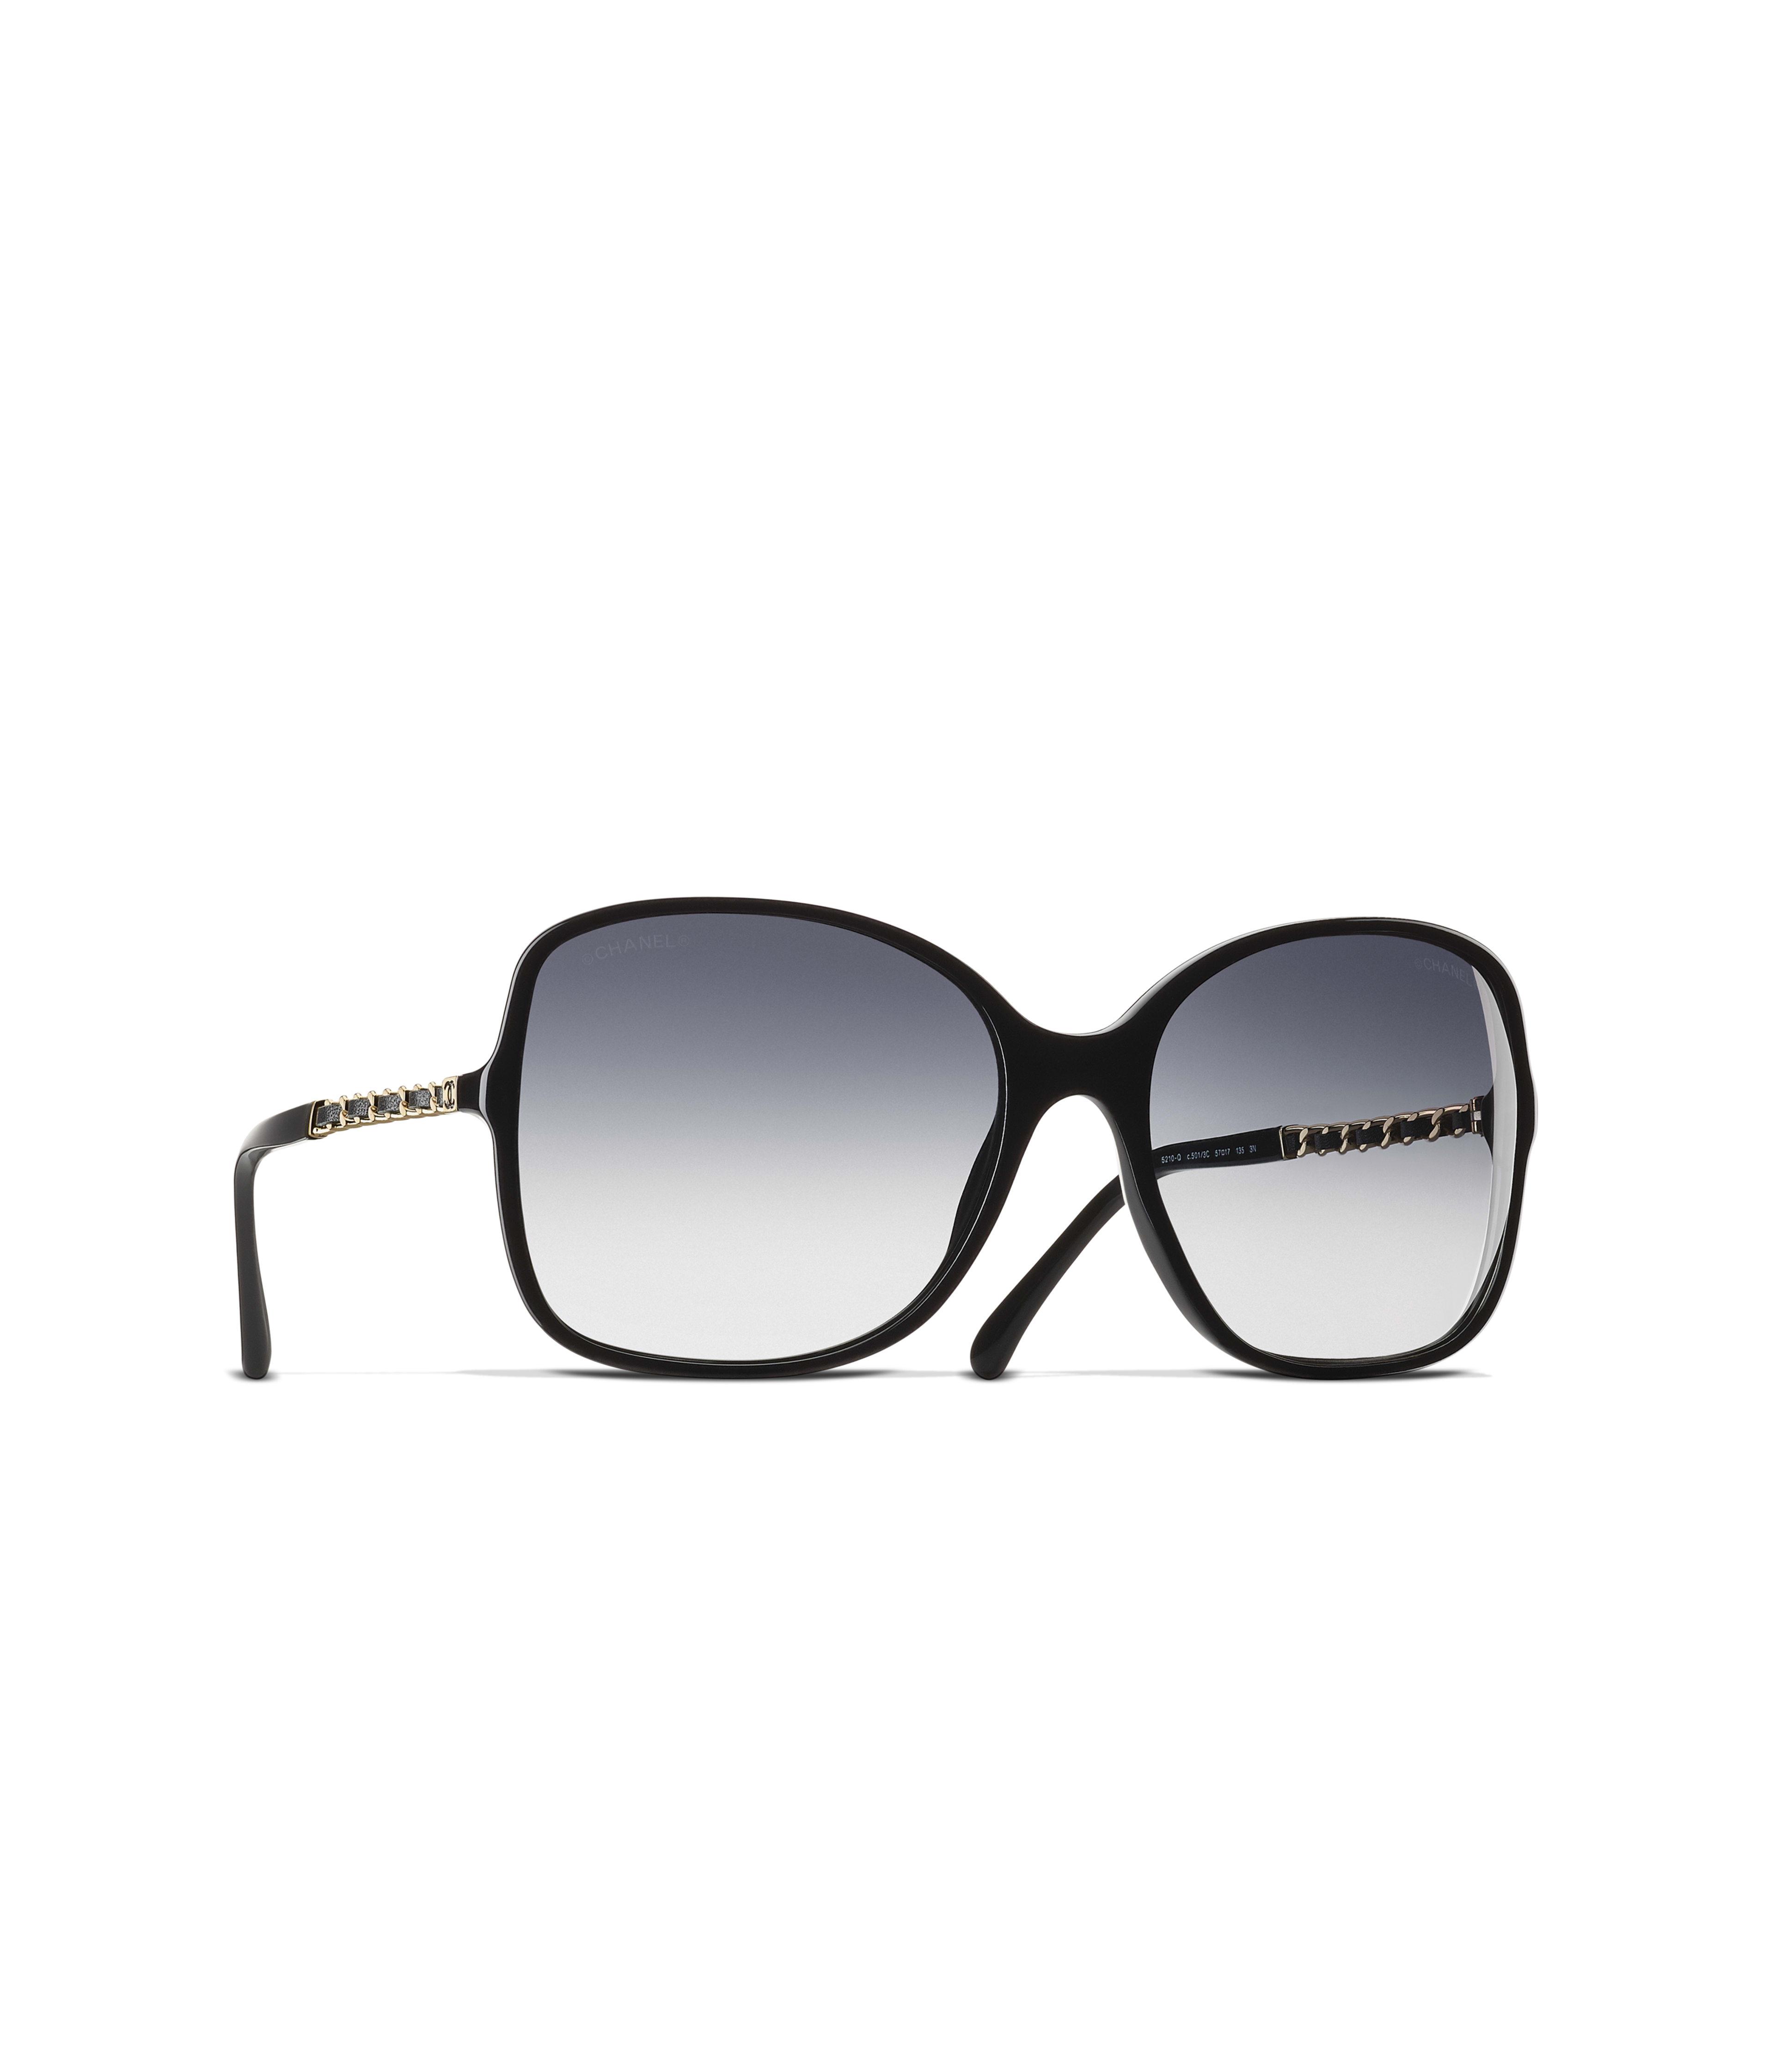 489ad2cb28a85 Square Sunglasses Ref. 5210Q C501 3C